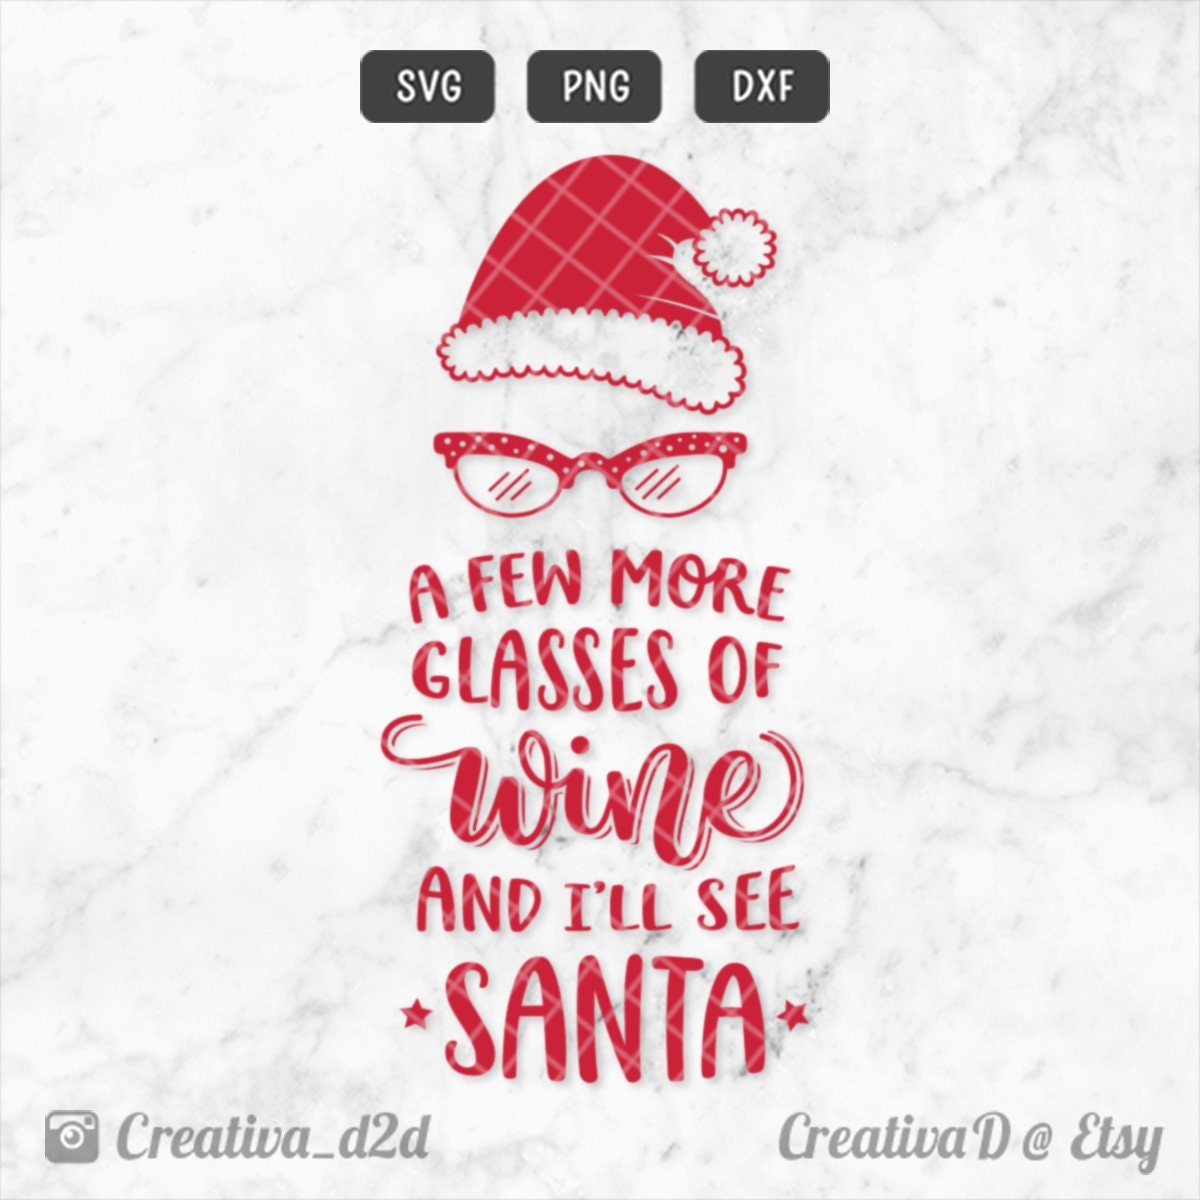 Funny Christmas SVG Santa Svg Wine Svg PNG DXF Clip Art ...